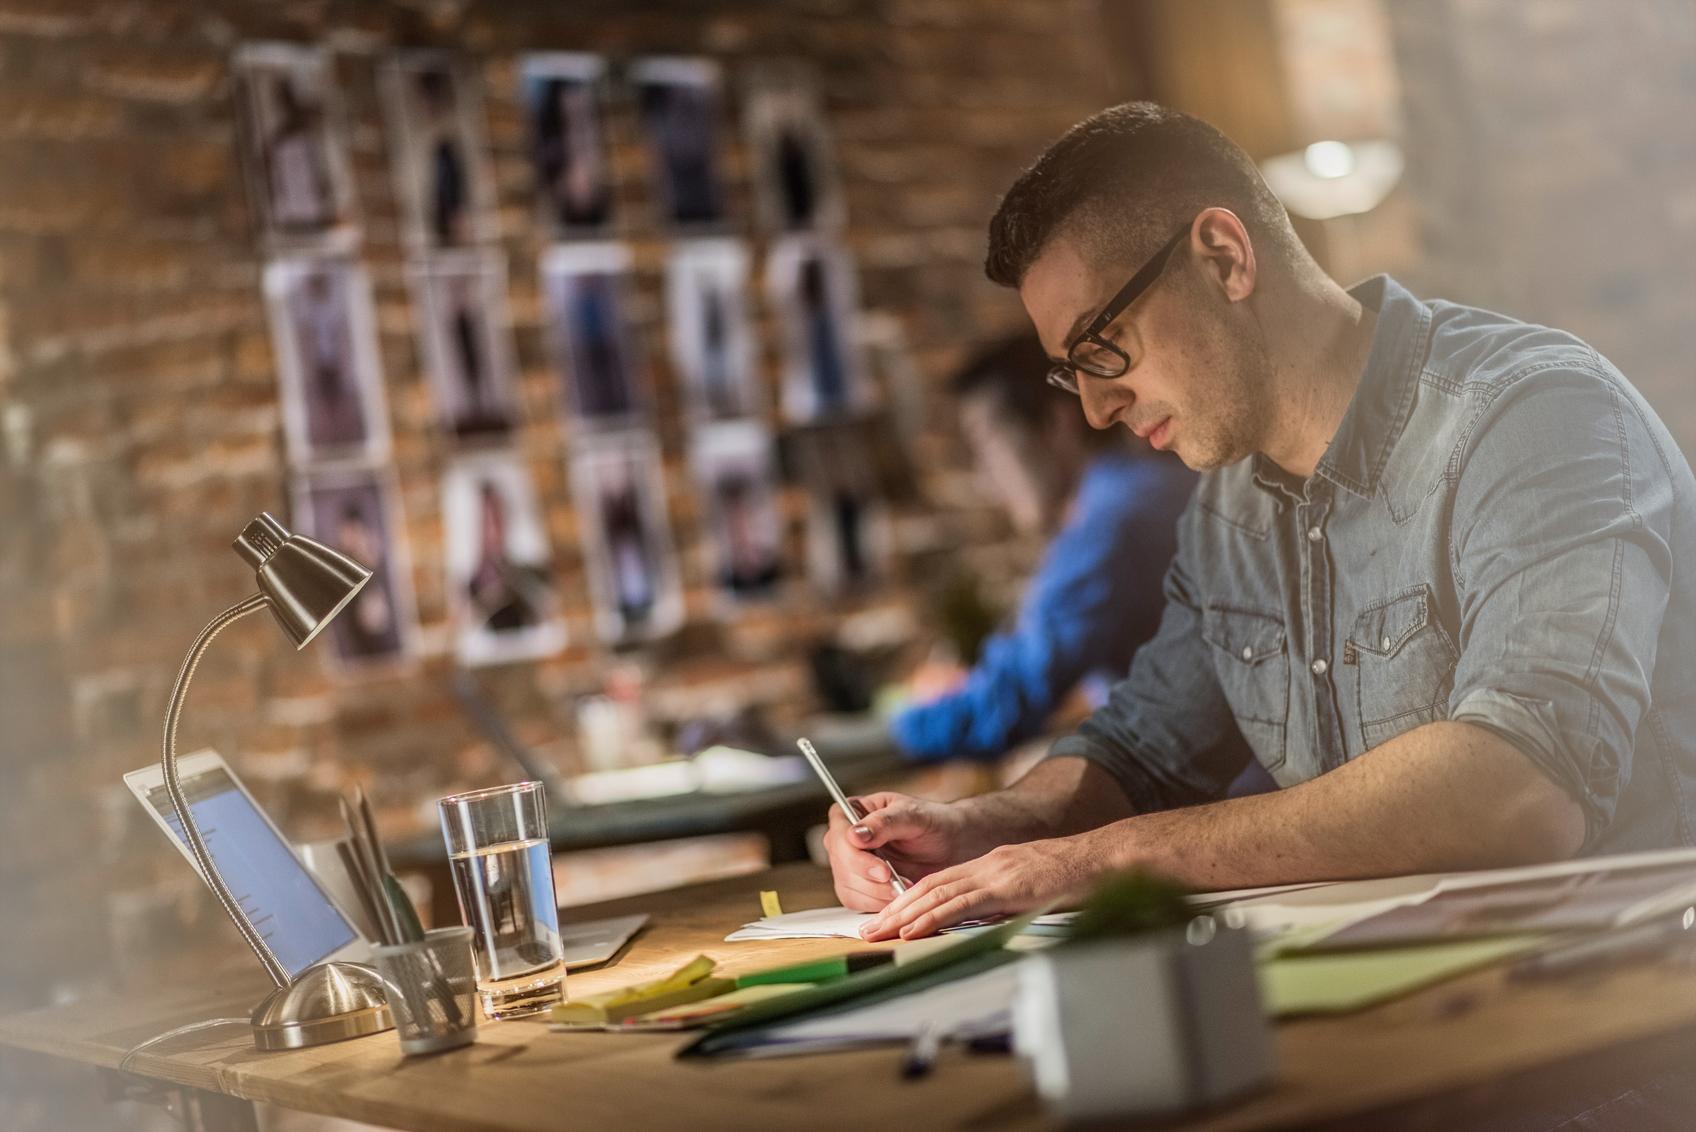 Graphic designer making sketches behind a desk